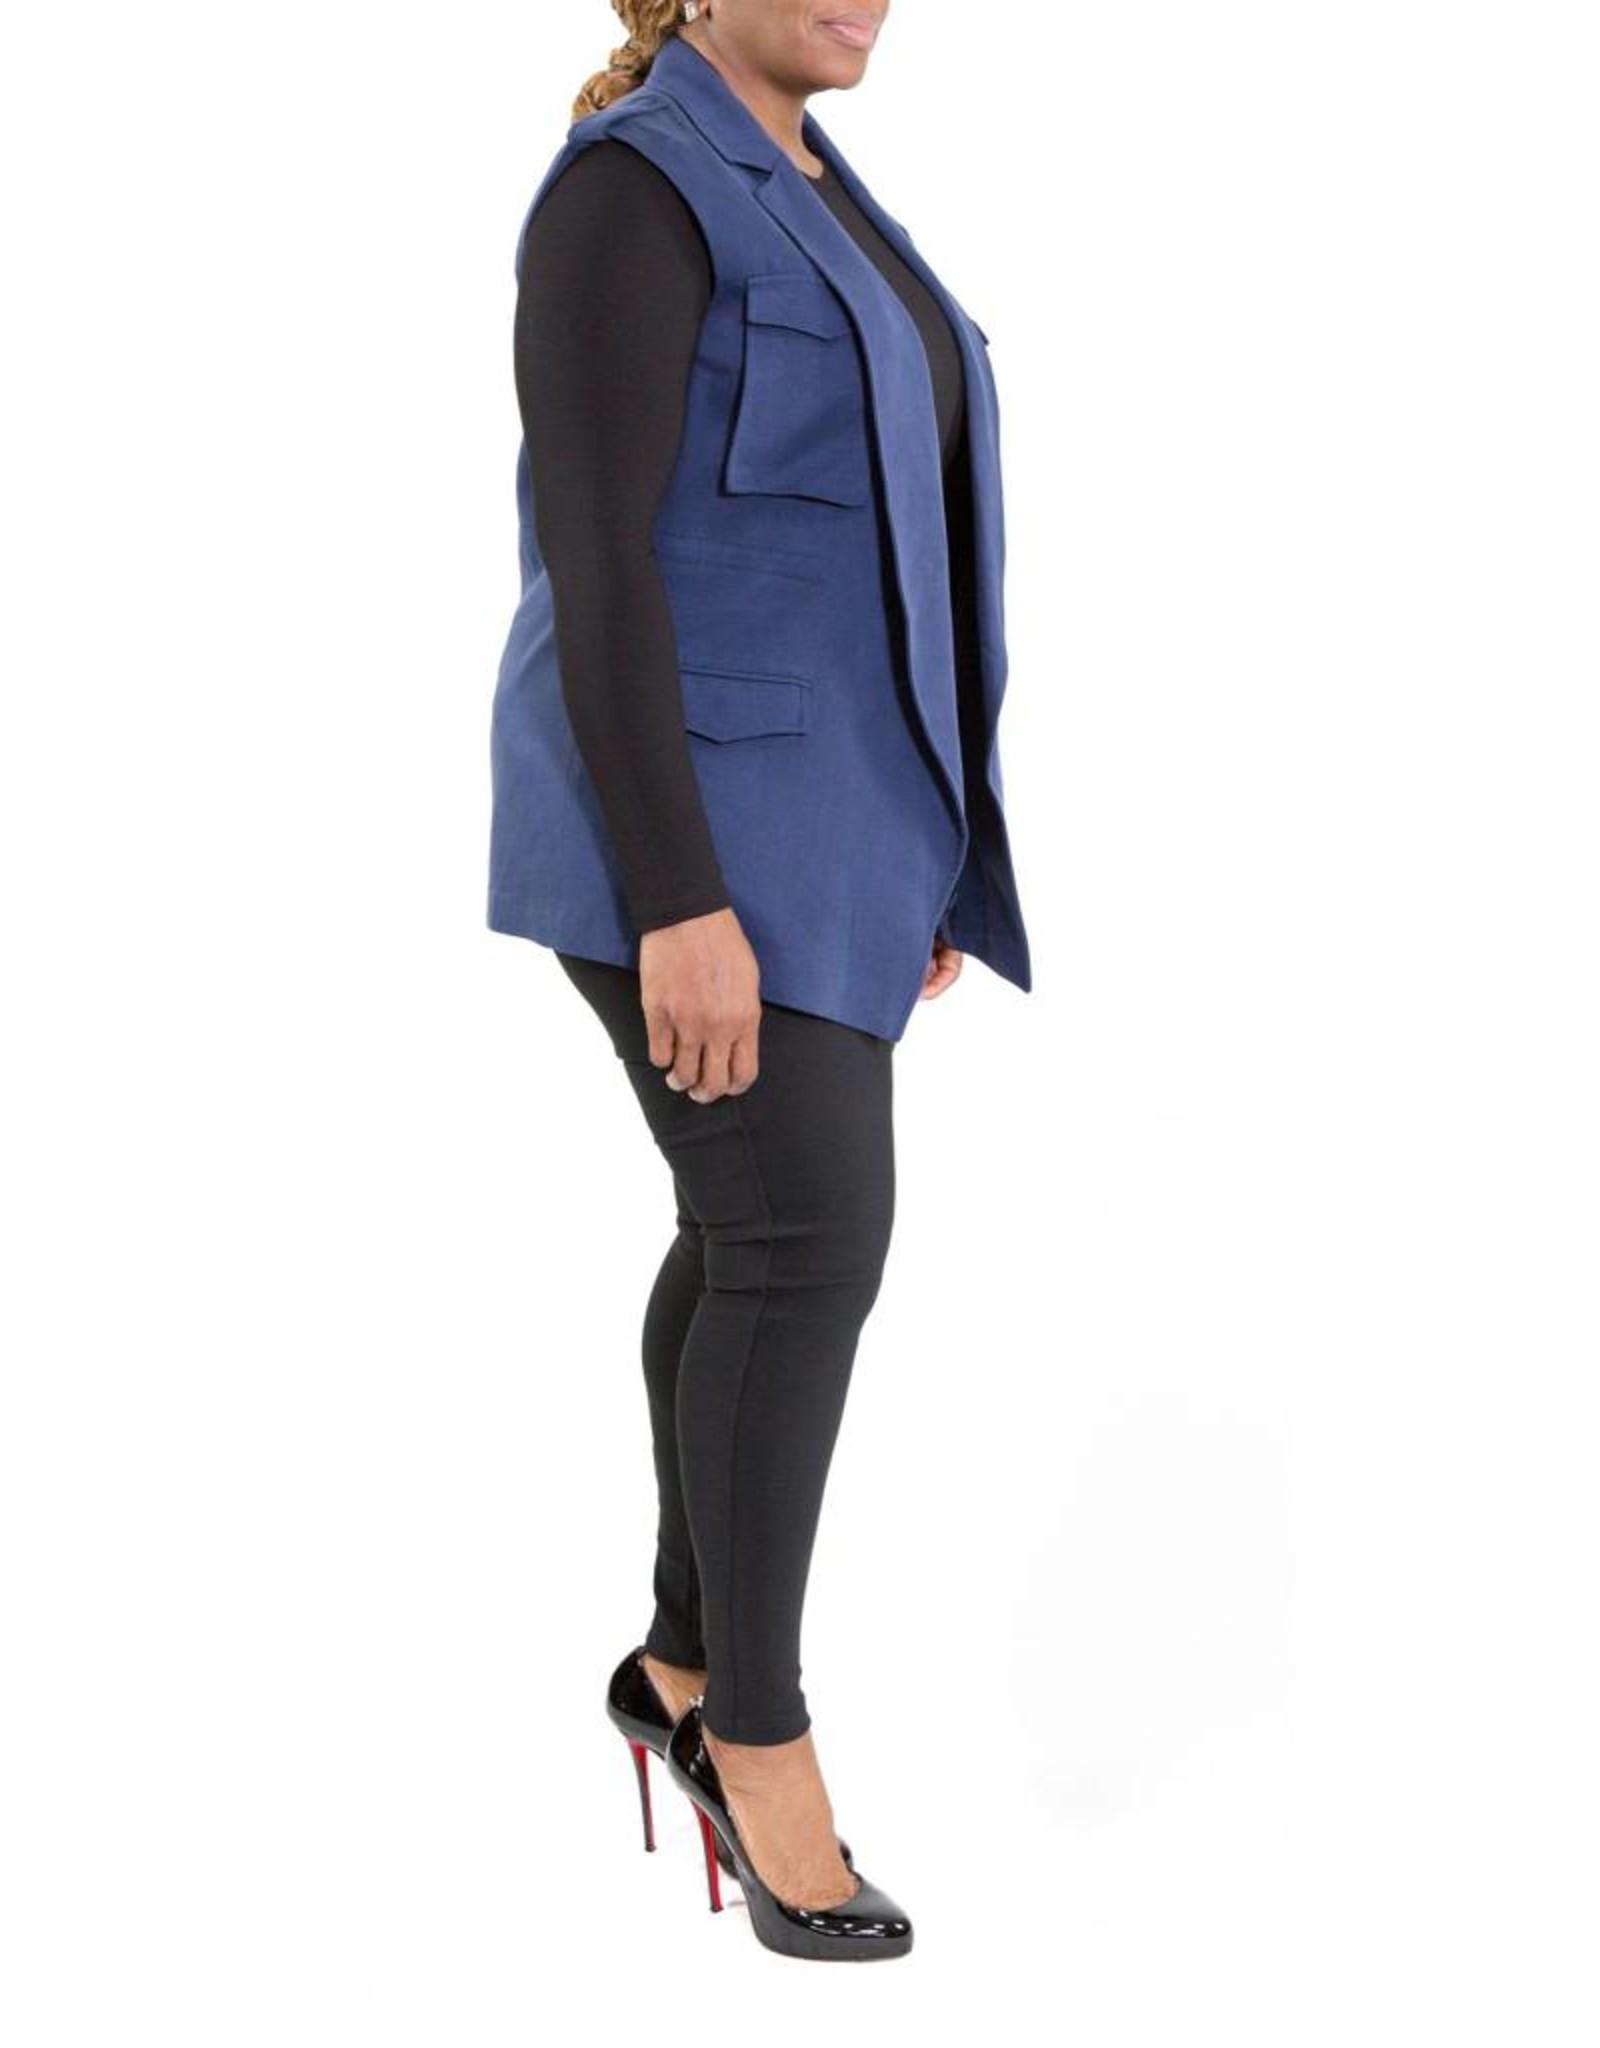 Lucille Vest Navy Blue